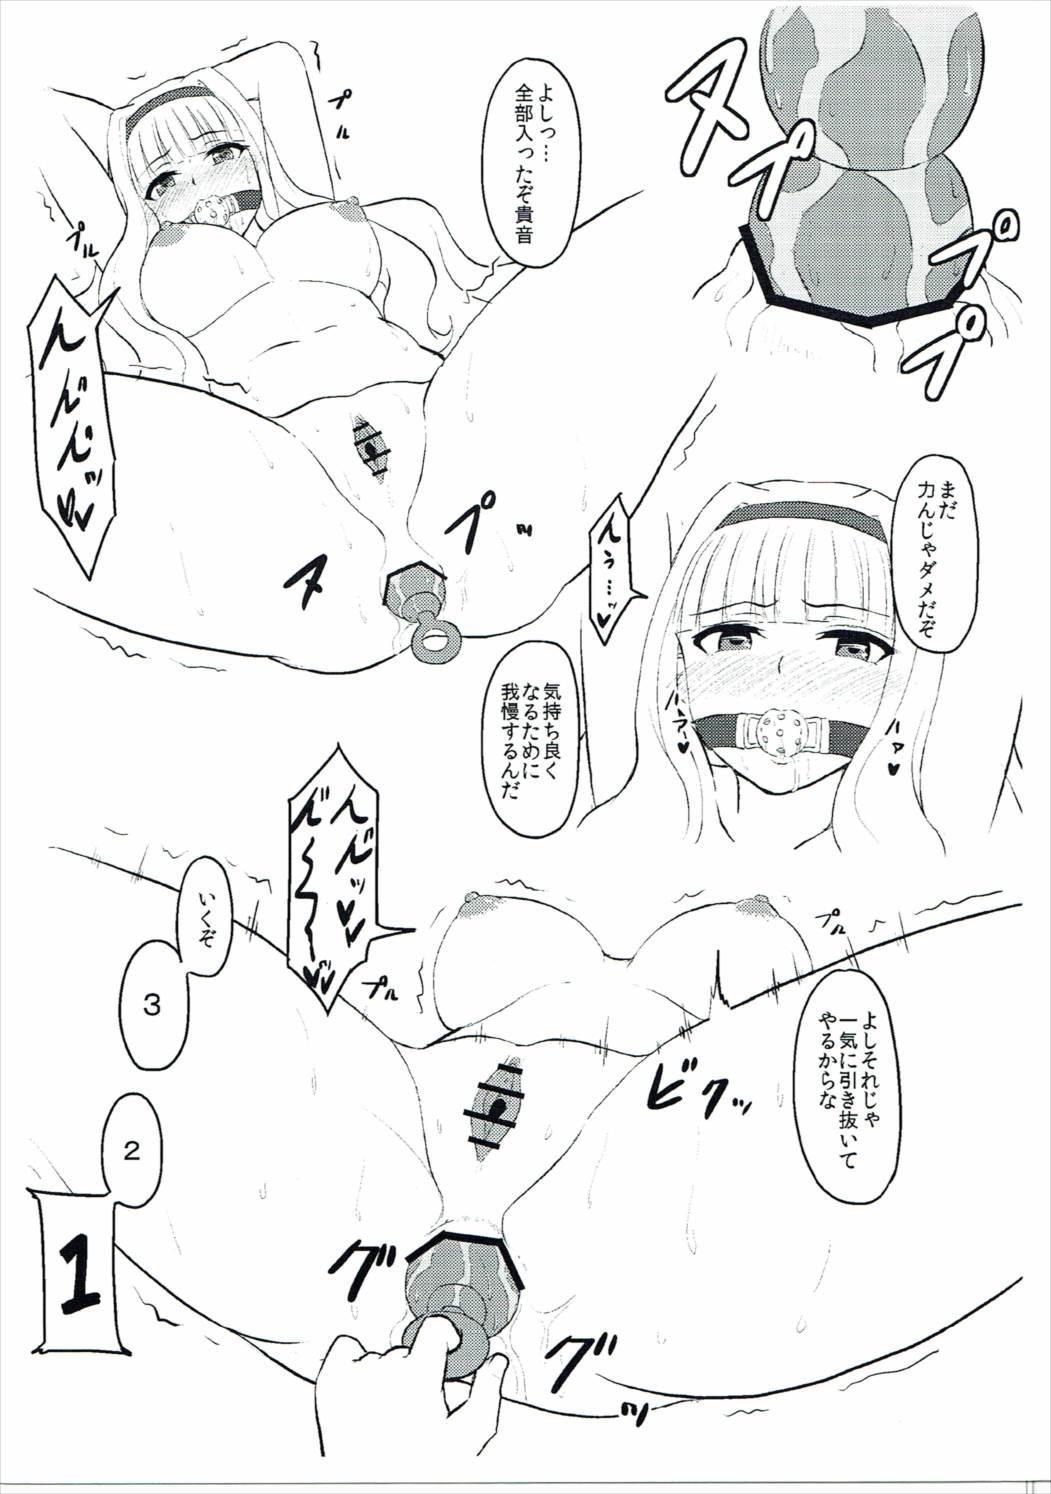 Shirihime Choukyou Omake 2